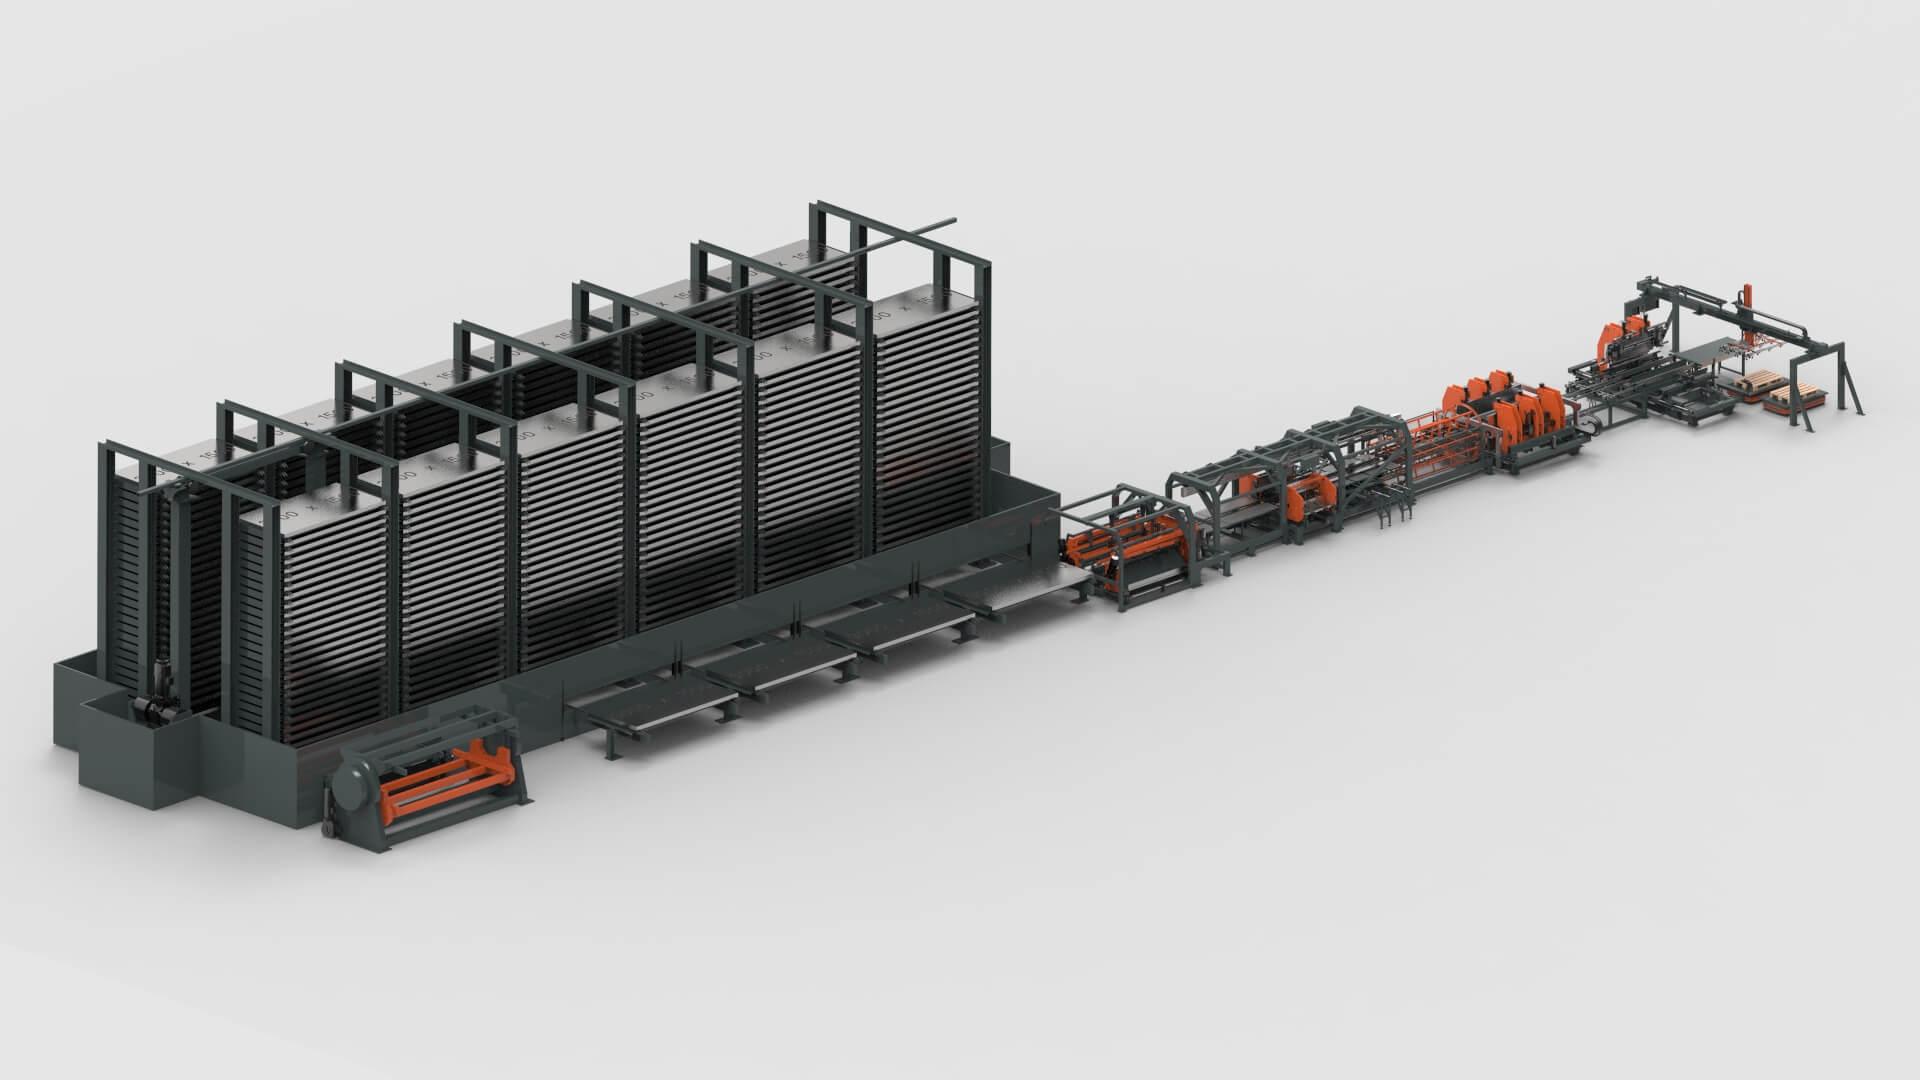 wemo-steel-doors-sheet-metal-storage-system-cutting-punching-bending-production-line.jpg